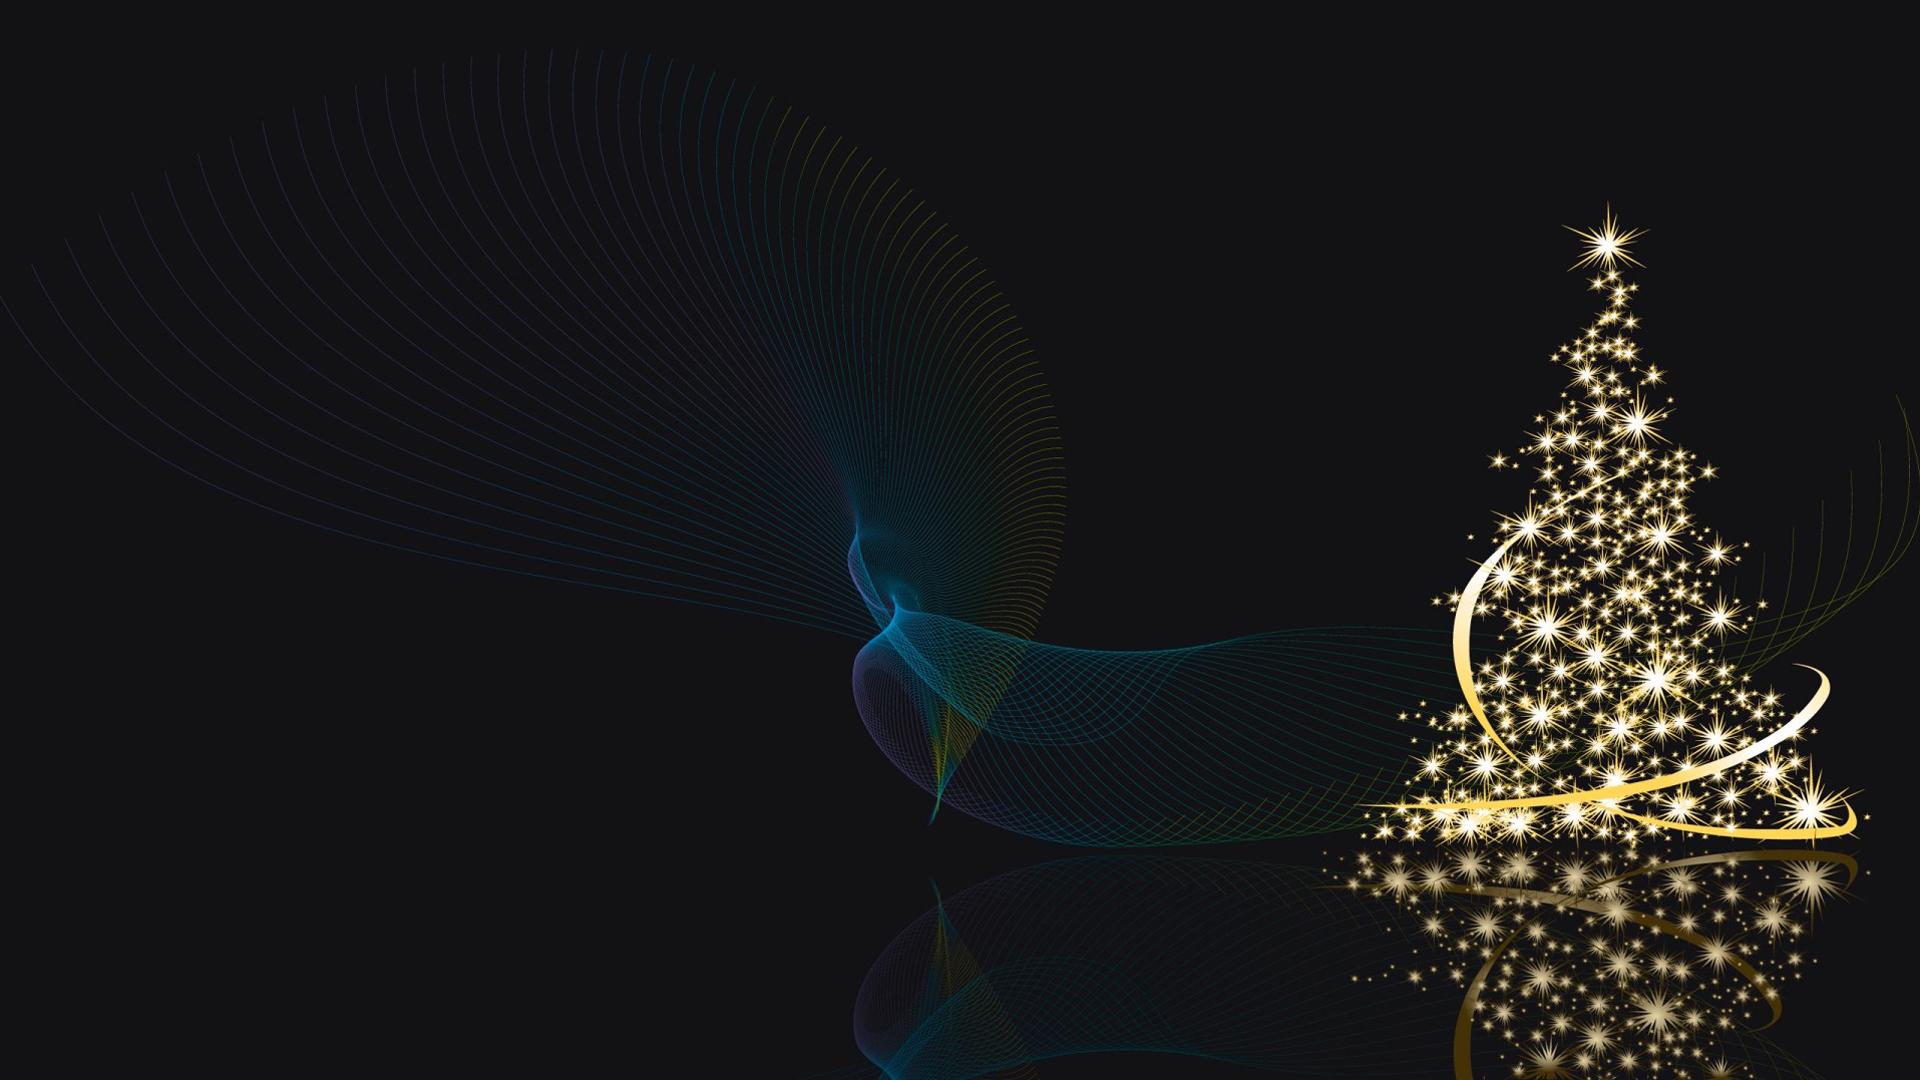 Free Download Wallpaper 2012 Wallpaper Christmas Background